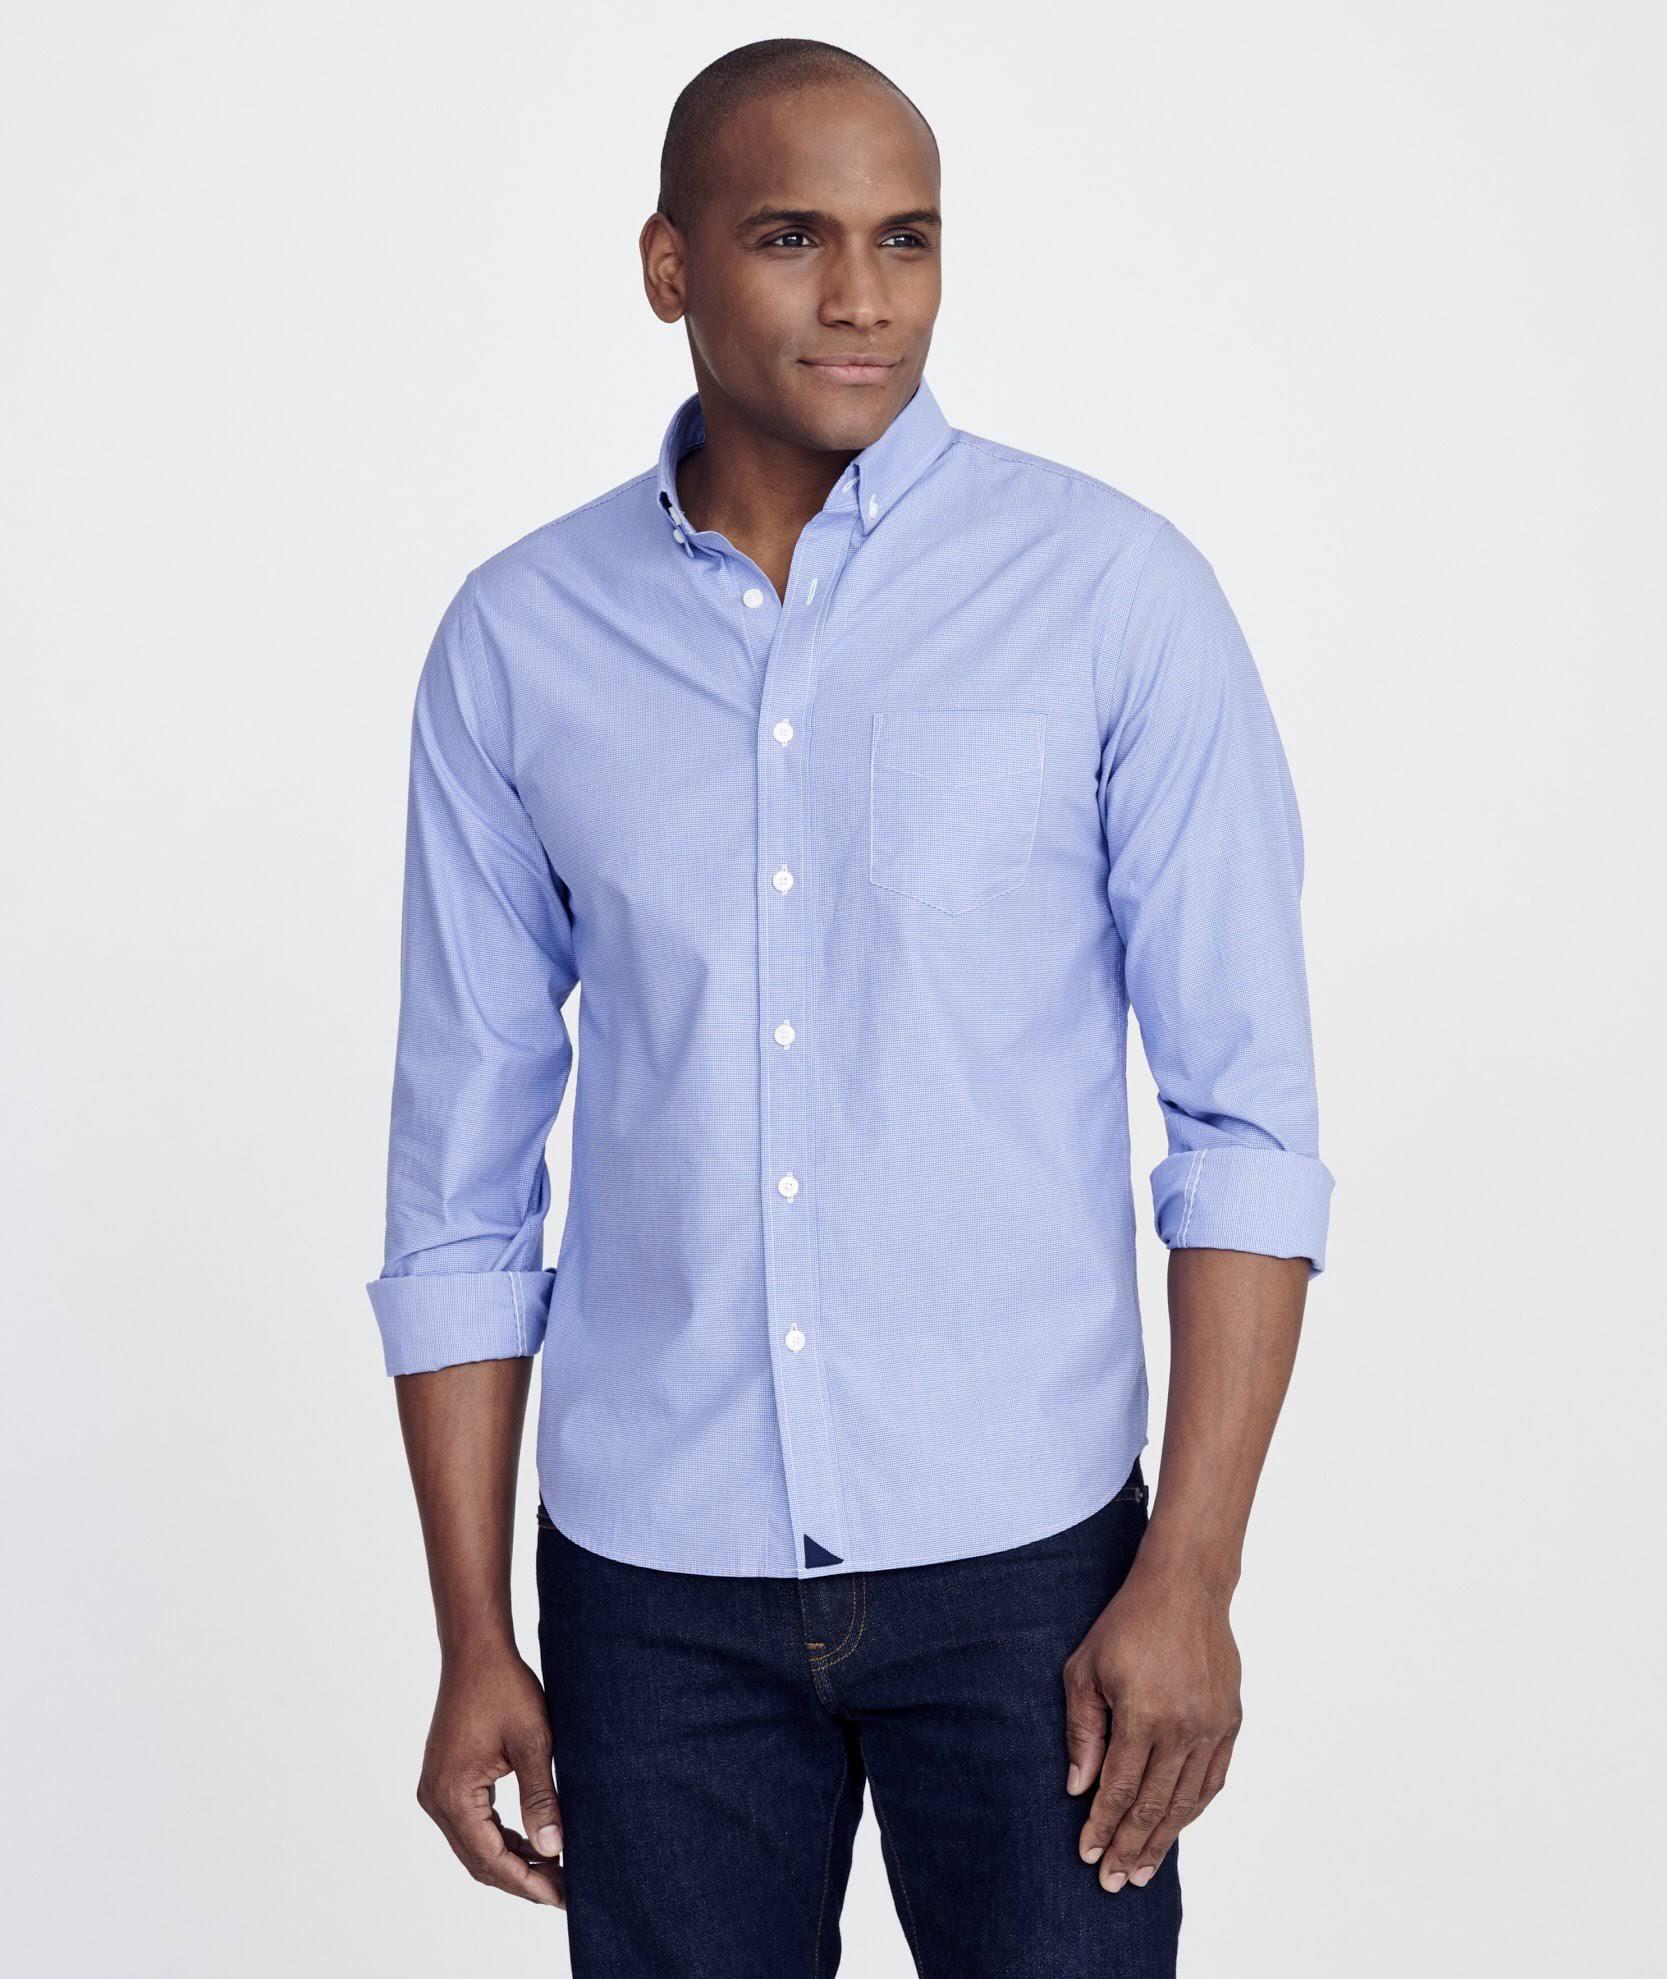 Azul Camisa Hombre Untuckit De Rossese 1g5WnwqTR